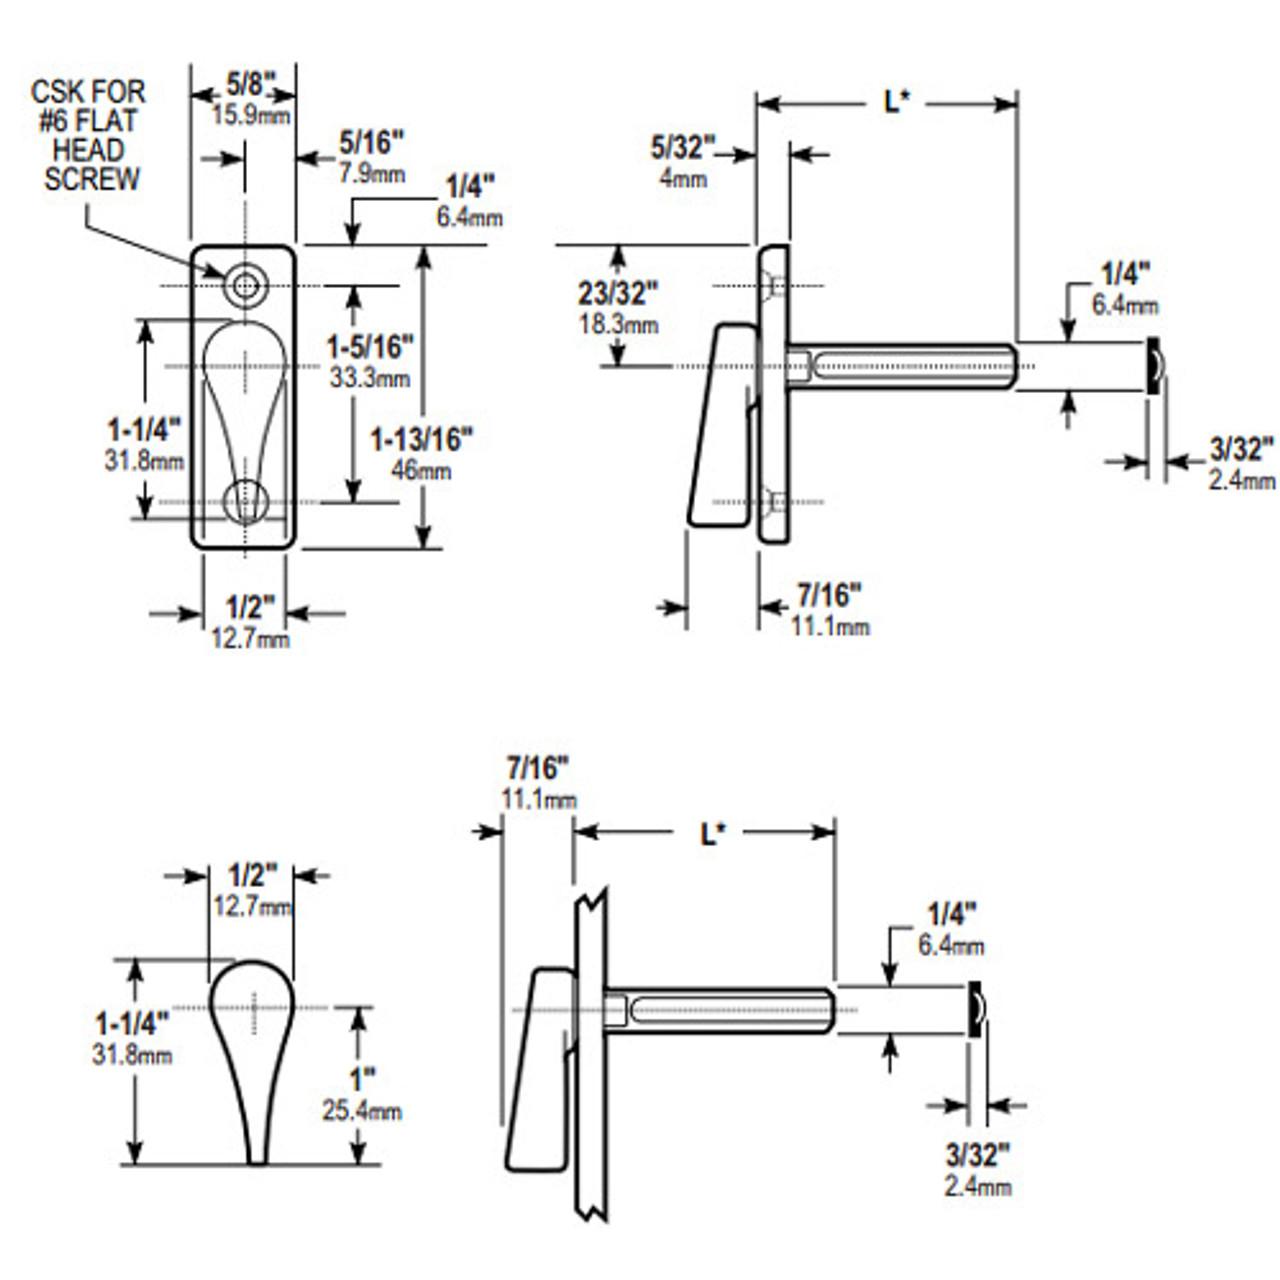 1000-21-23-121 Adams Rite 1000 Series Turns Dimensional View